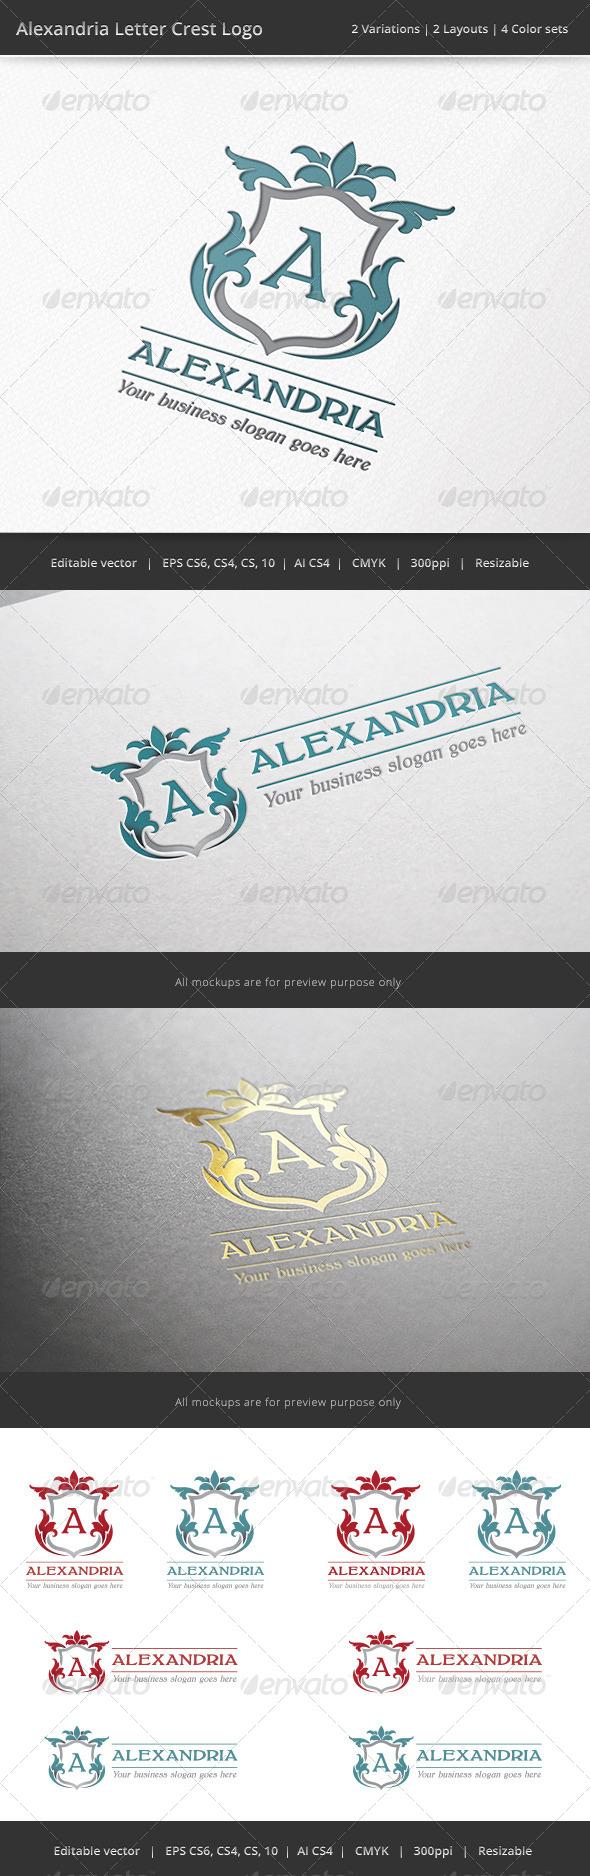 Alexandria Letter Crest Logo - Crests Logo Templates